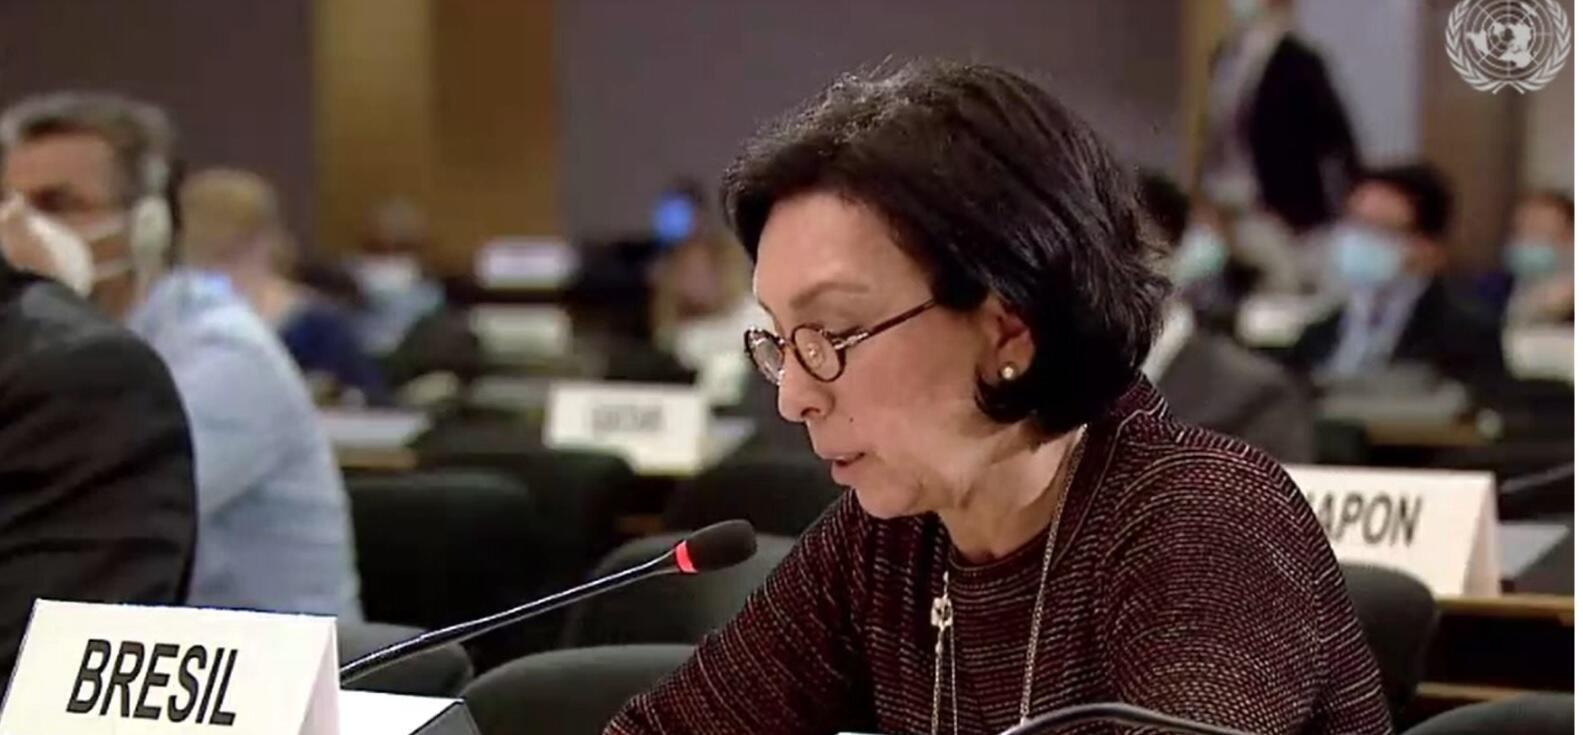 A embaixadora do Brasil Maria Nazareth Farani Azevedo